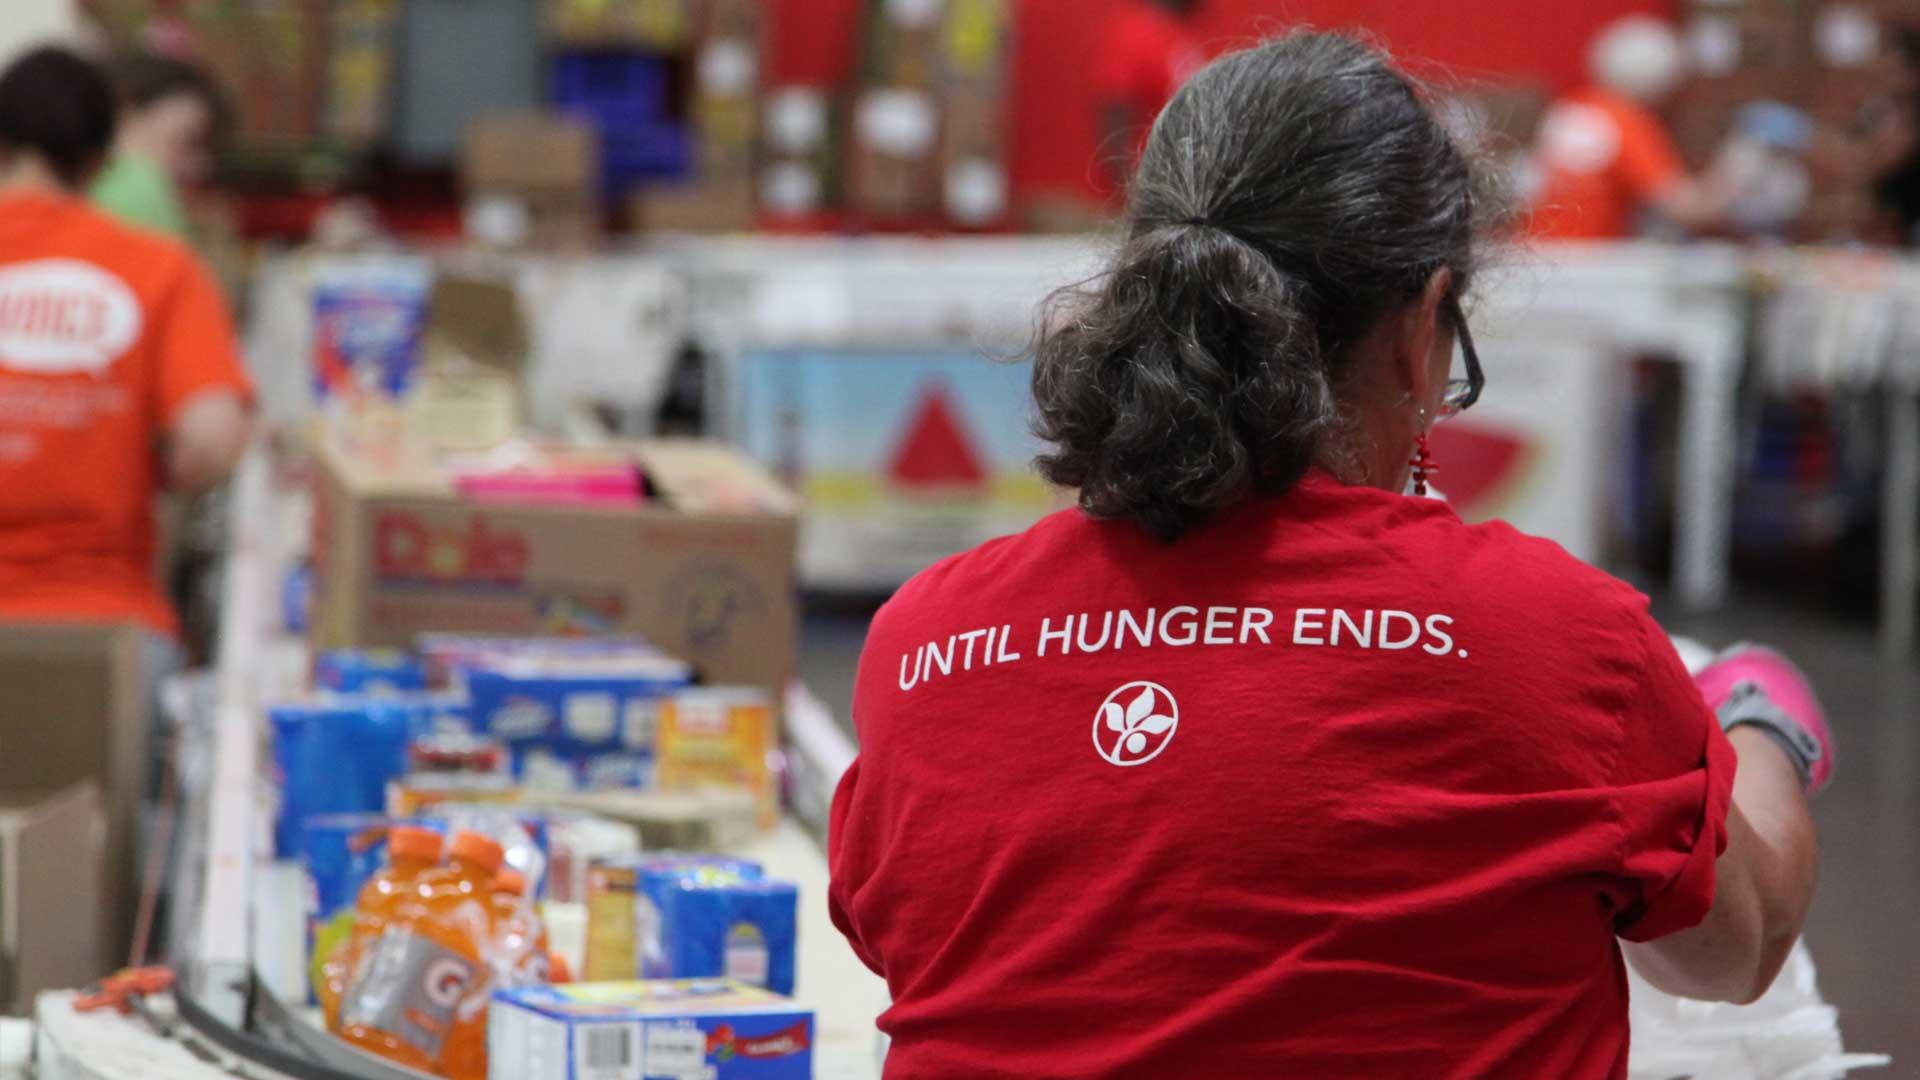 volunteer in an until hunger ends t-shirt